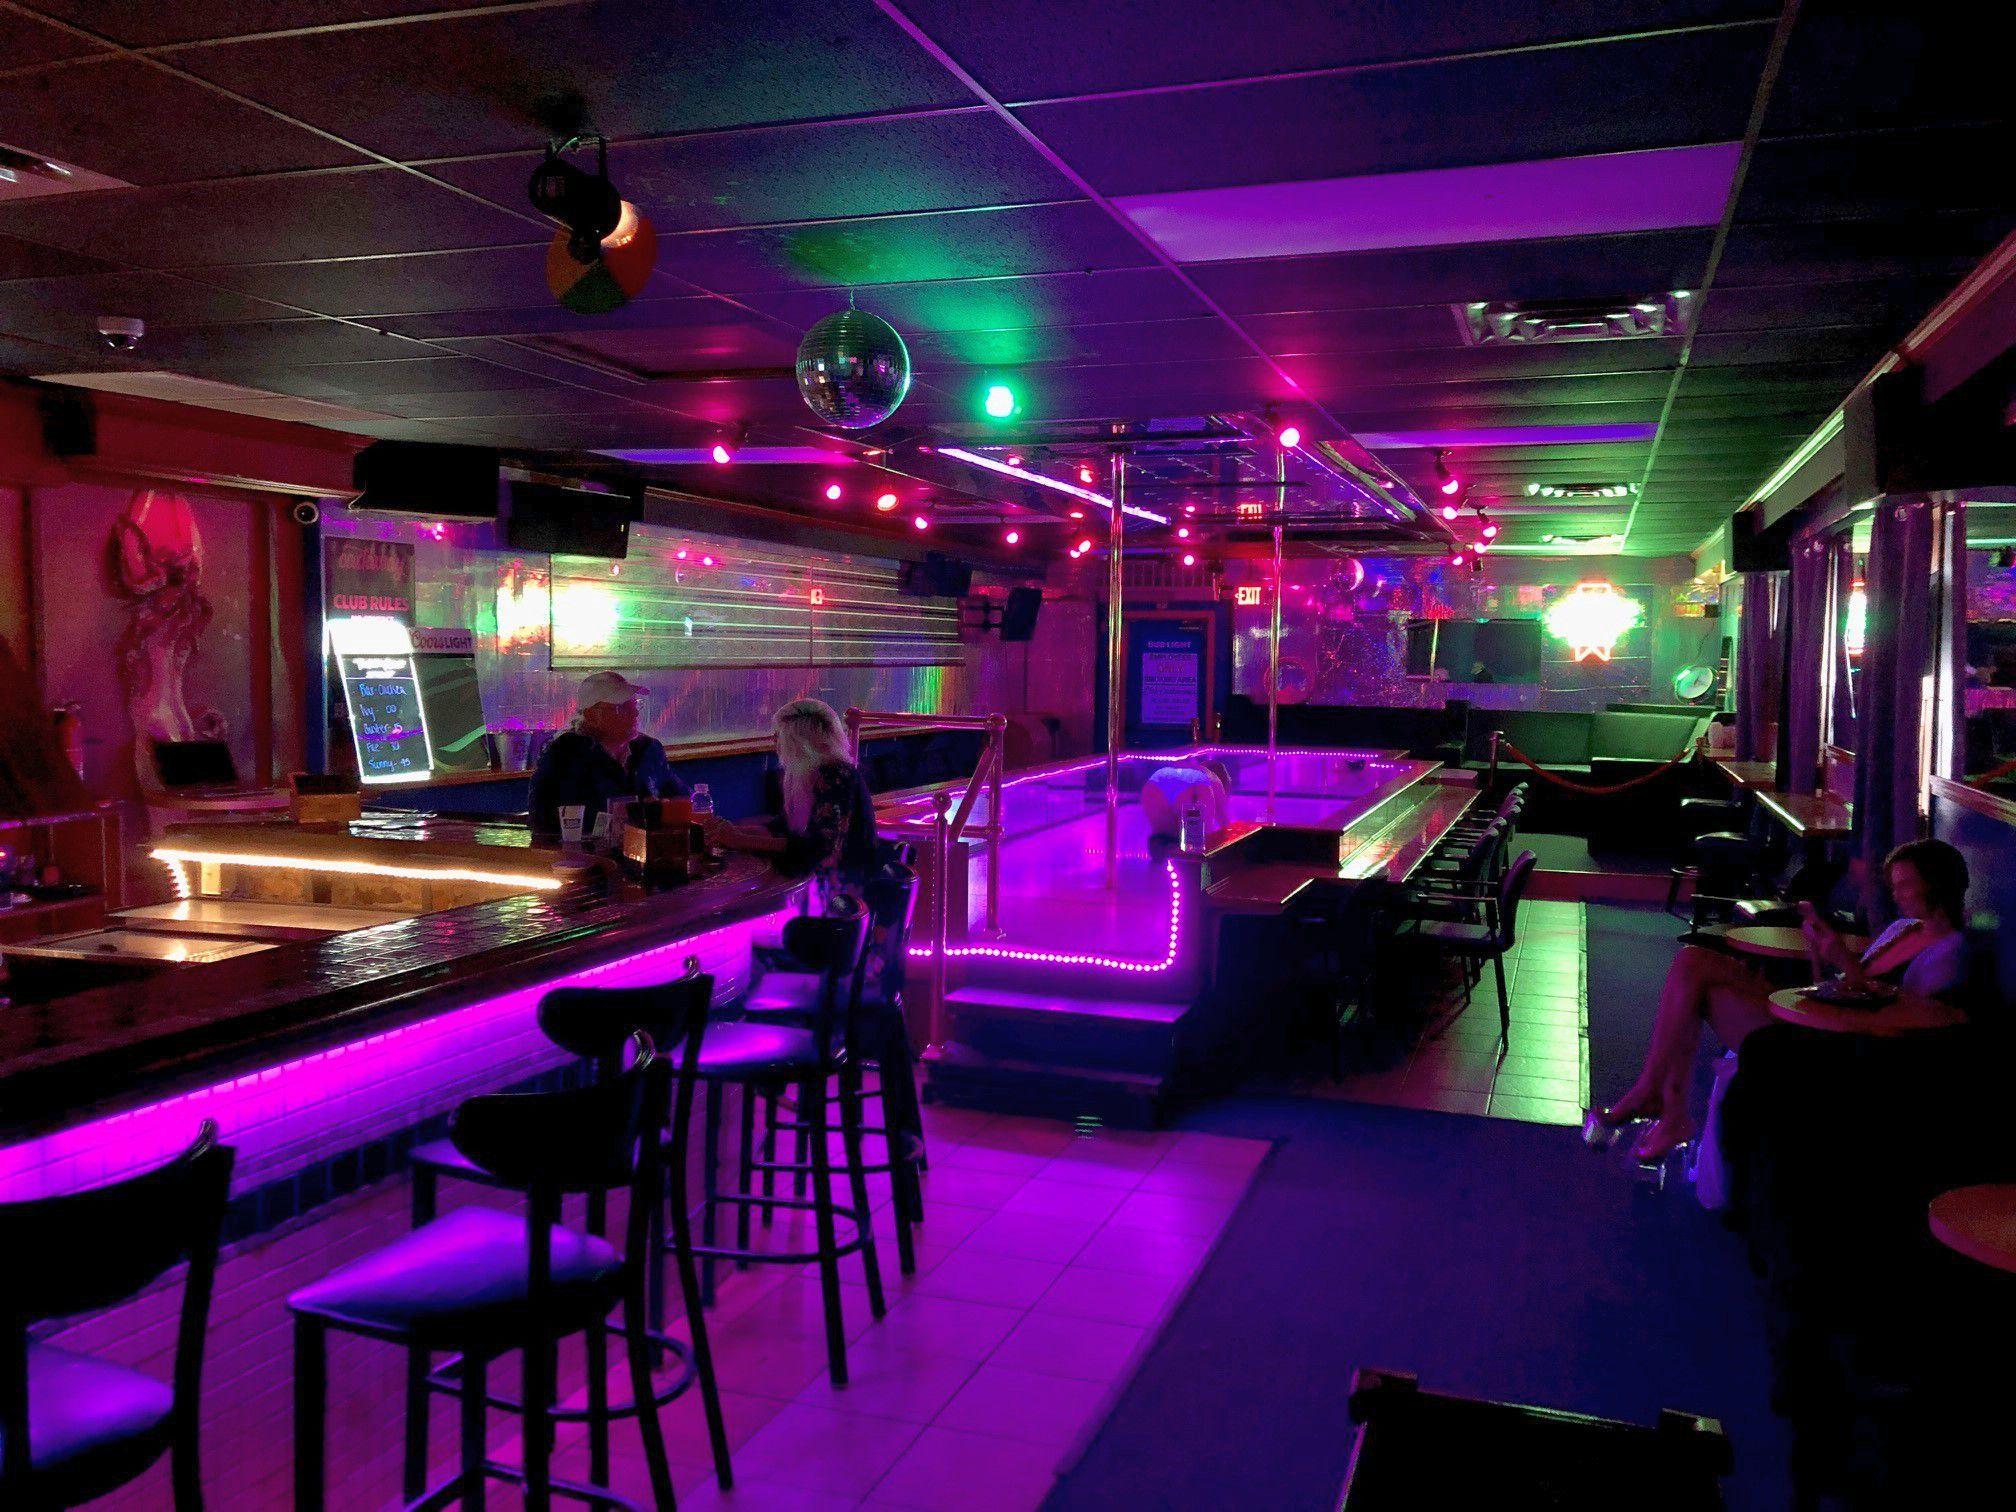 Strip clubs in mobile al